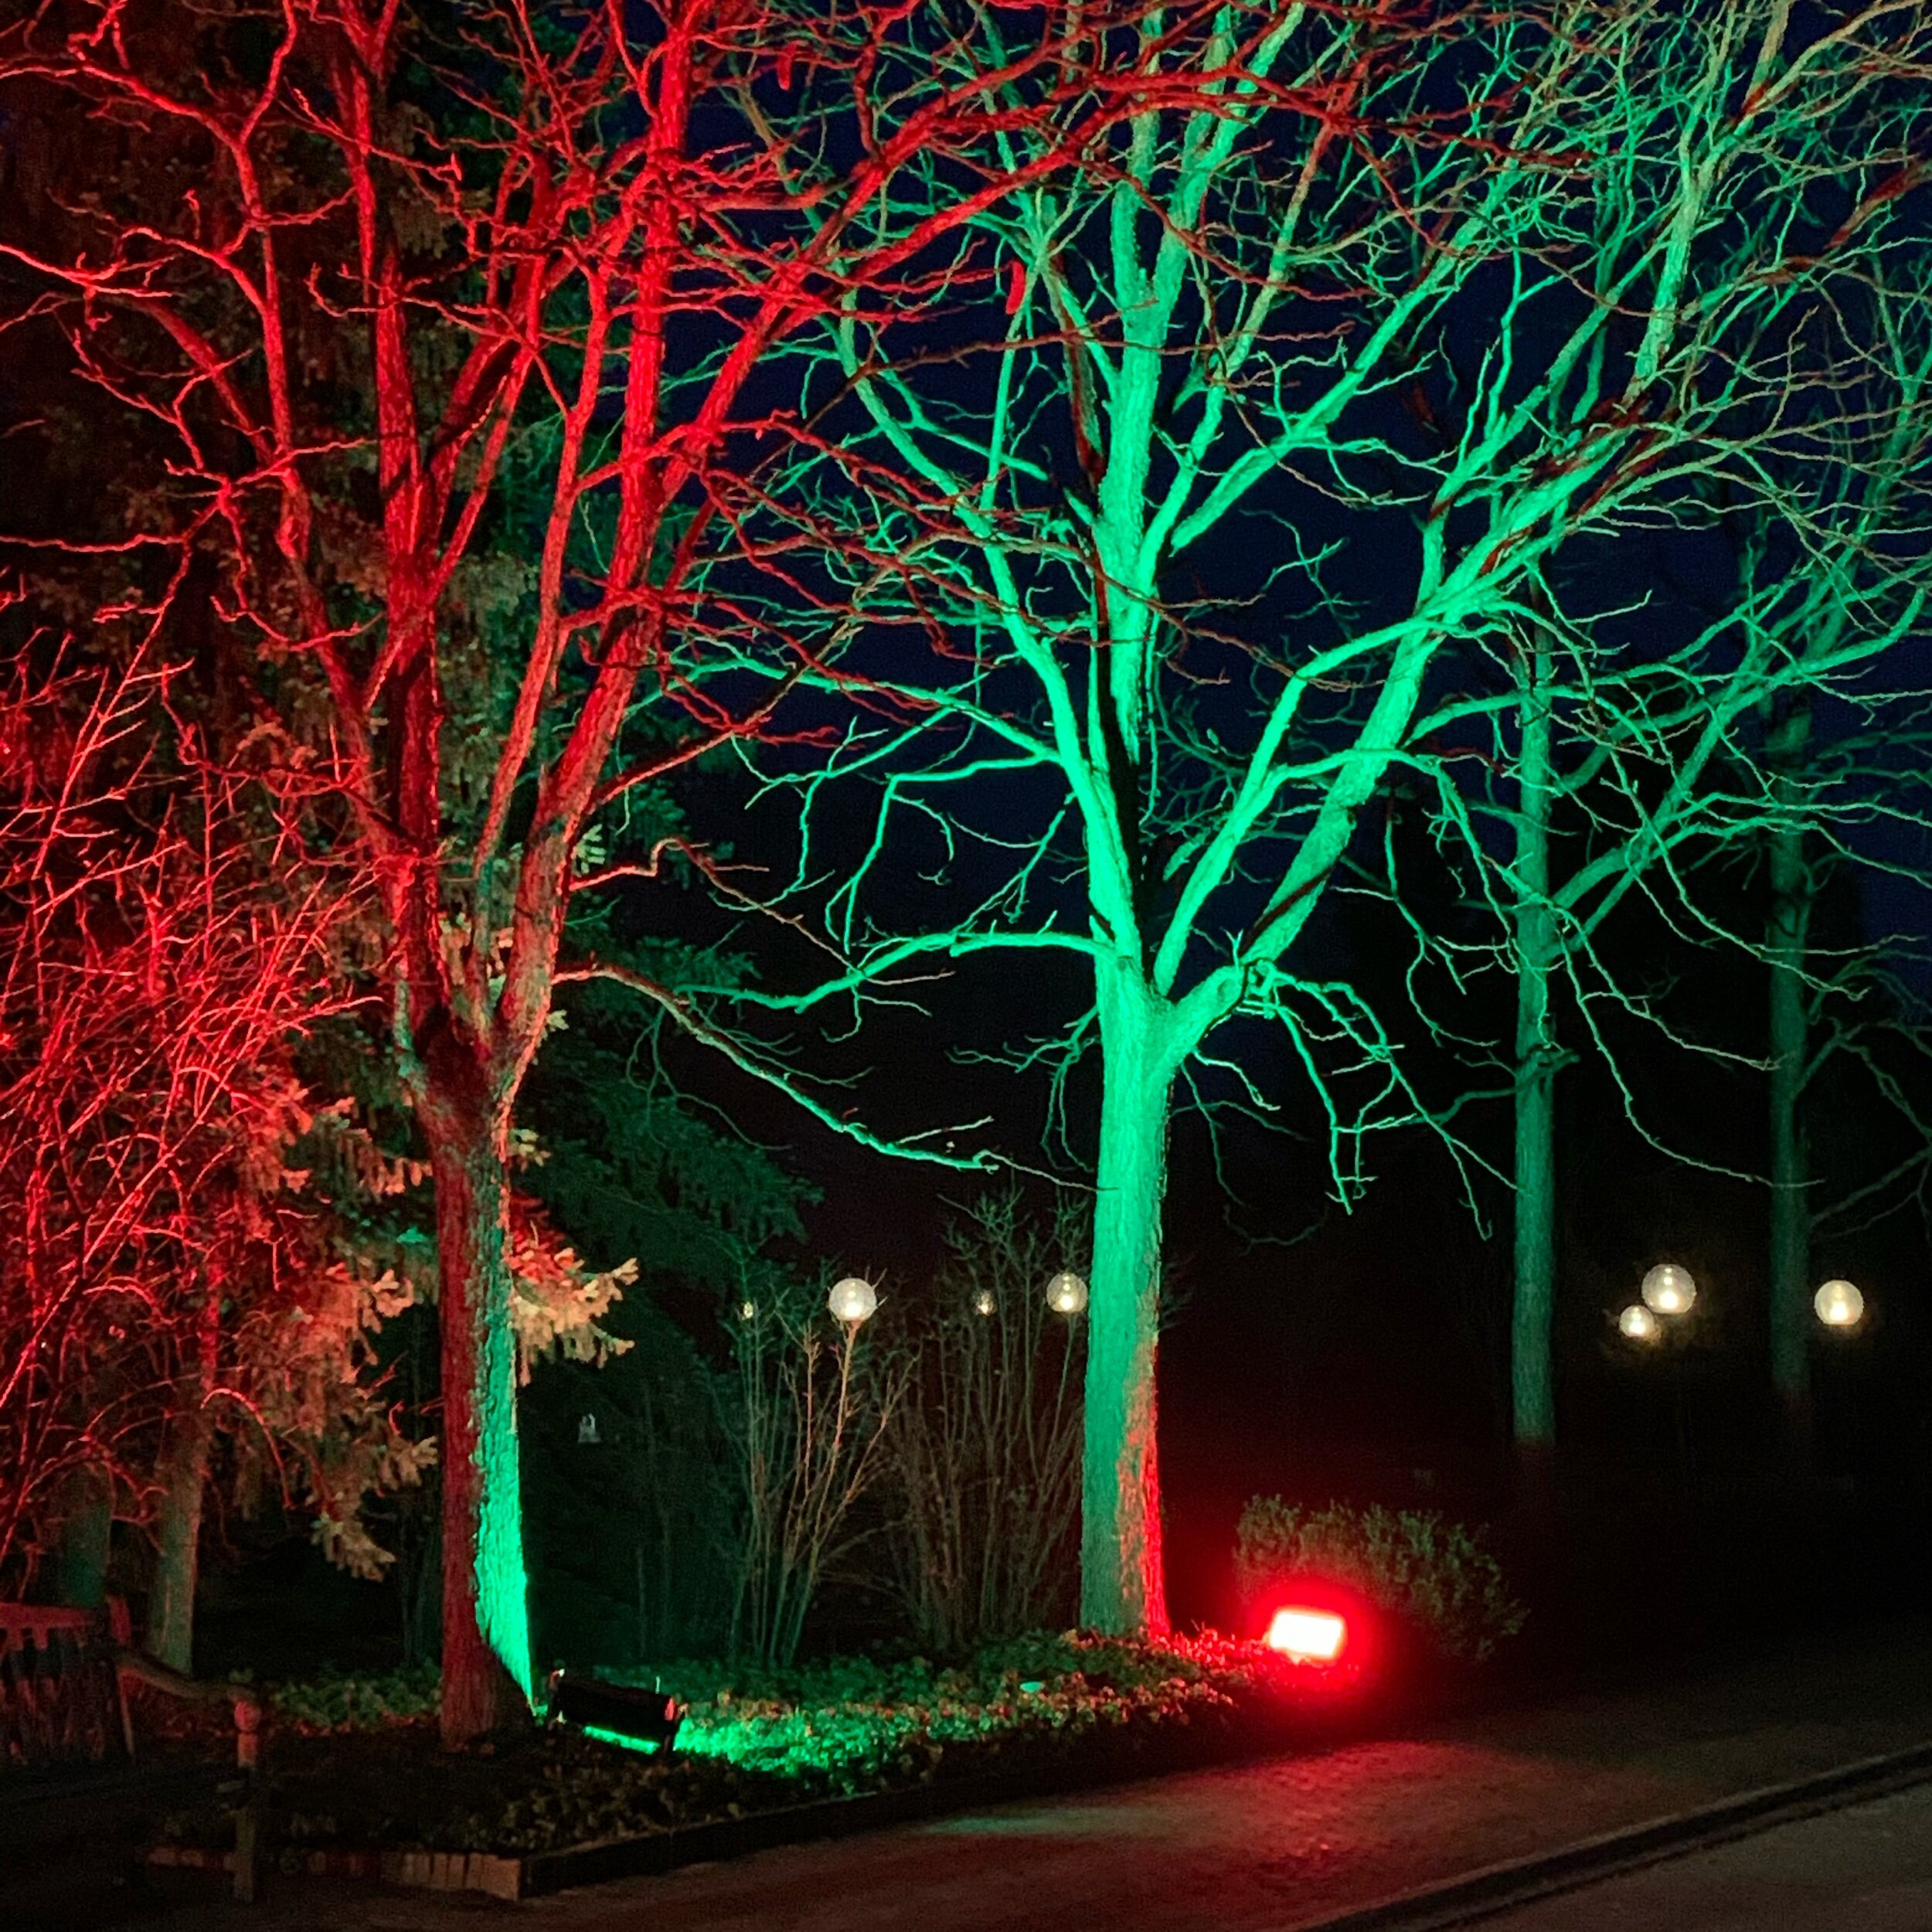 The Chicago Botanic Garden Christmas Lightscape Show